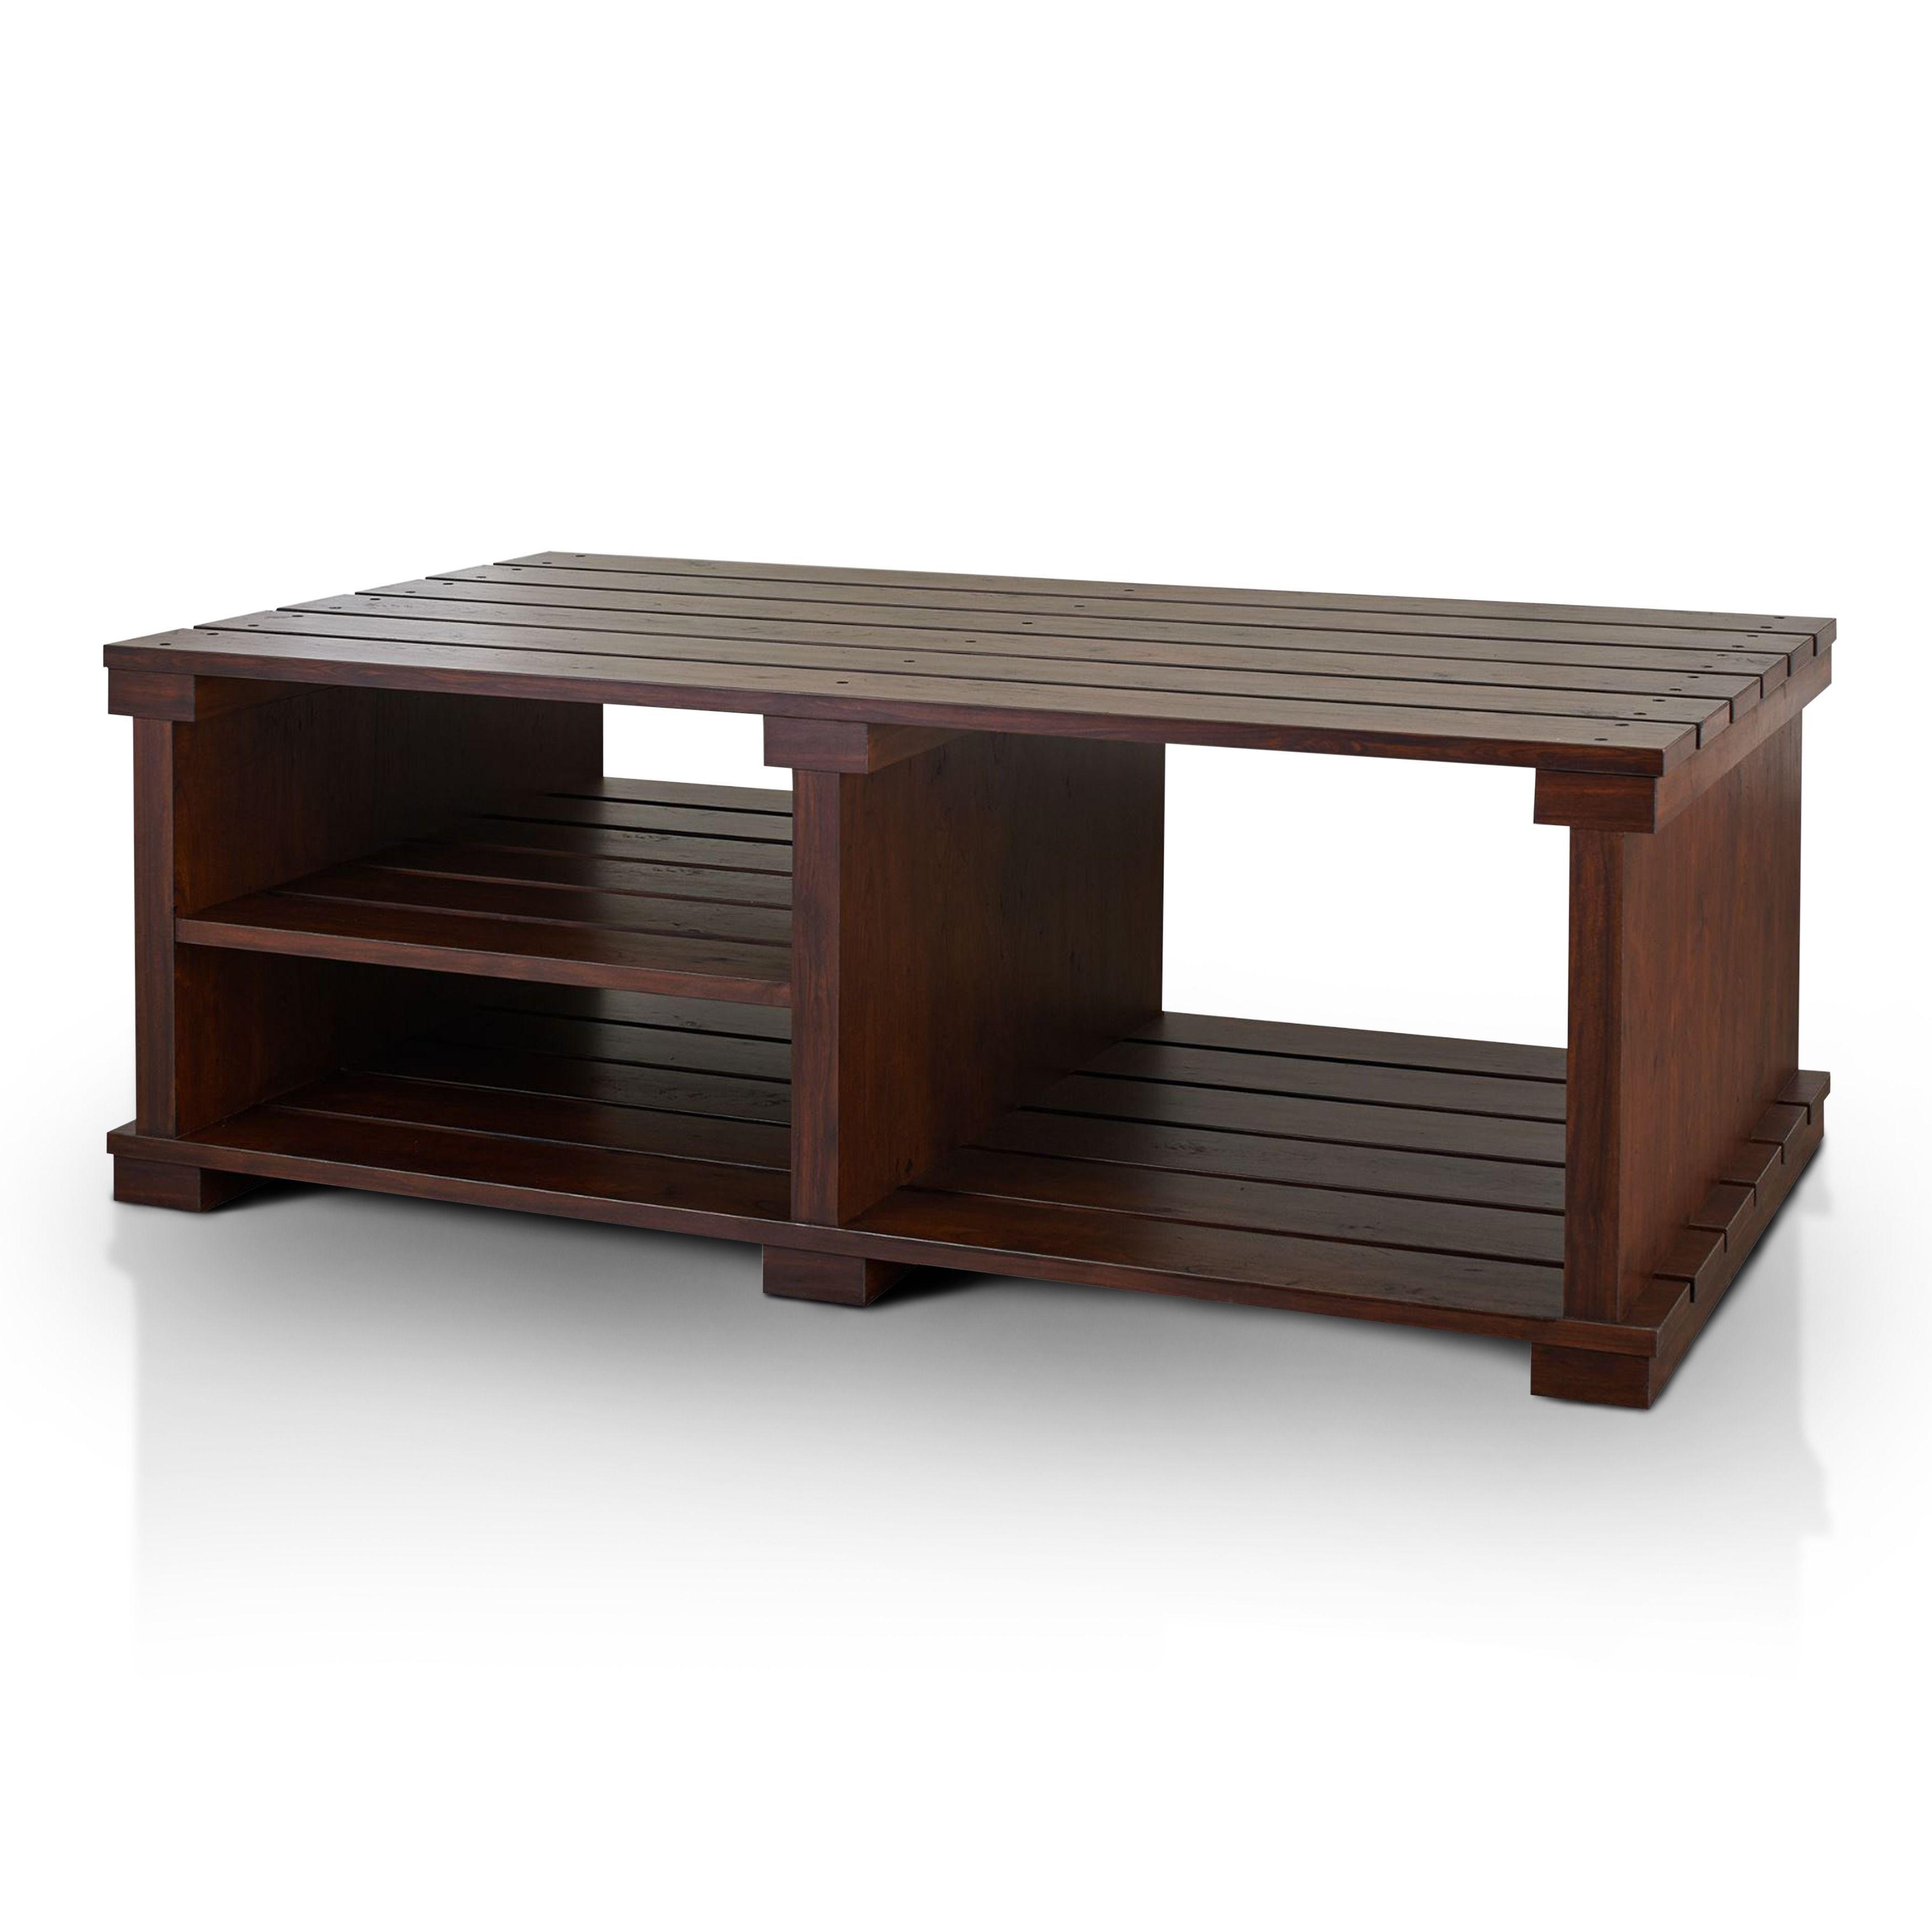 Furniture of america brenetta 3 shelf vintage walnut coffee table vintage walnut brown